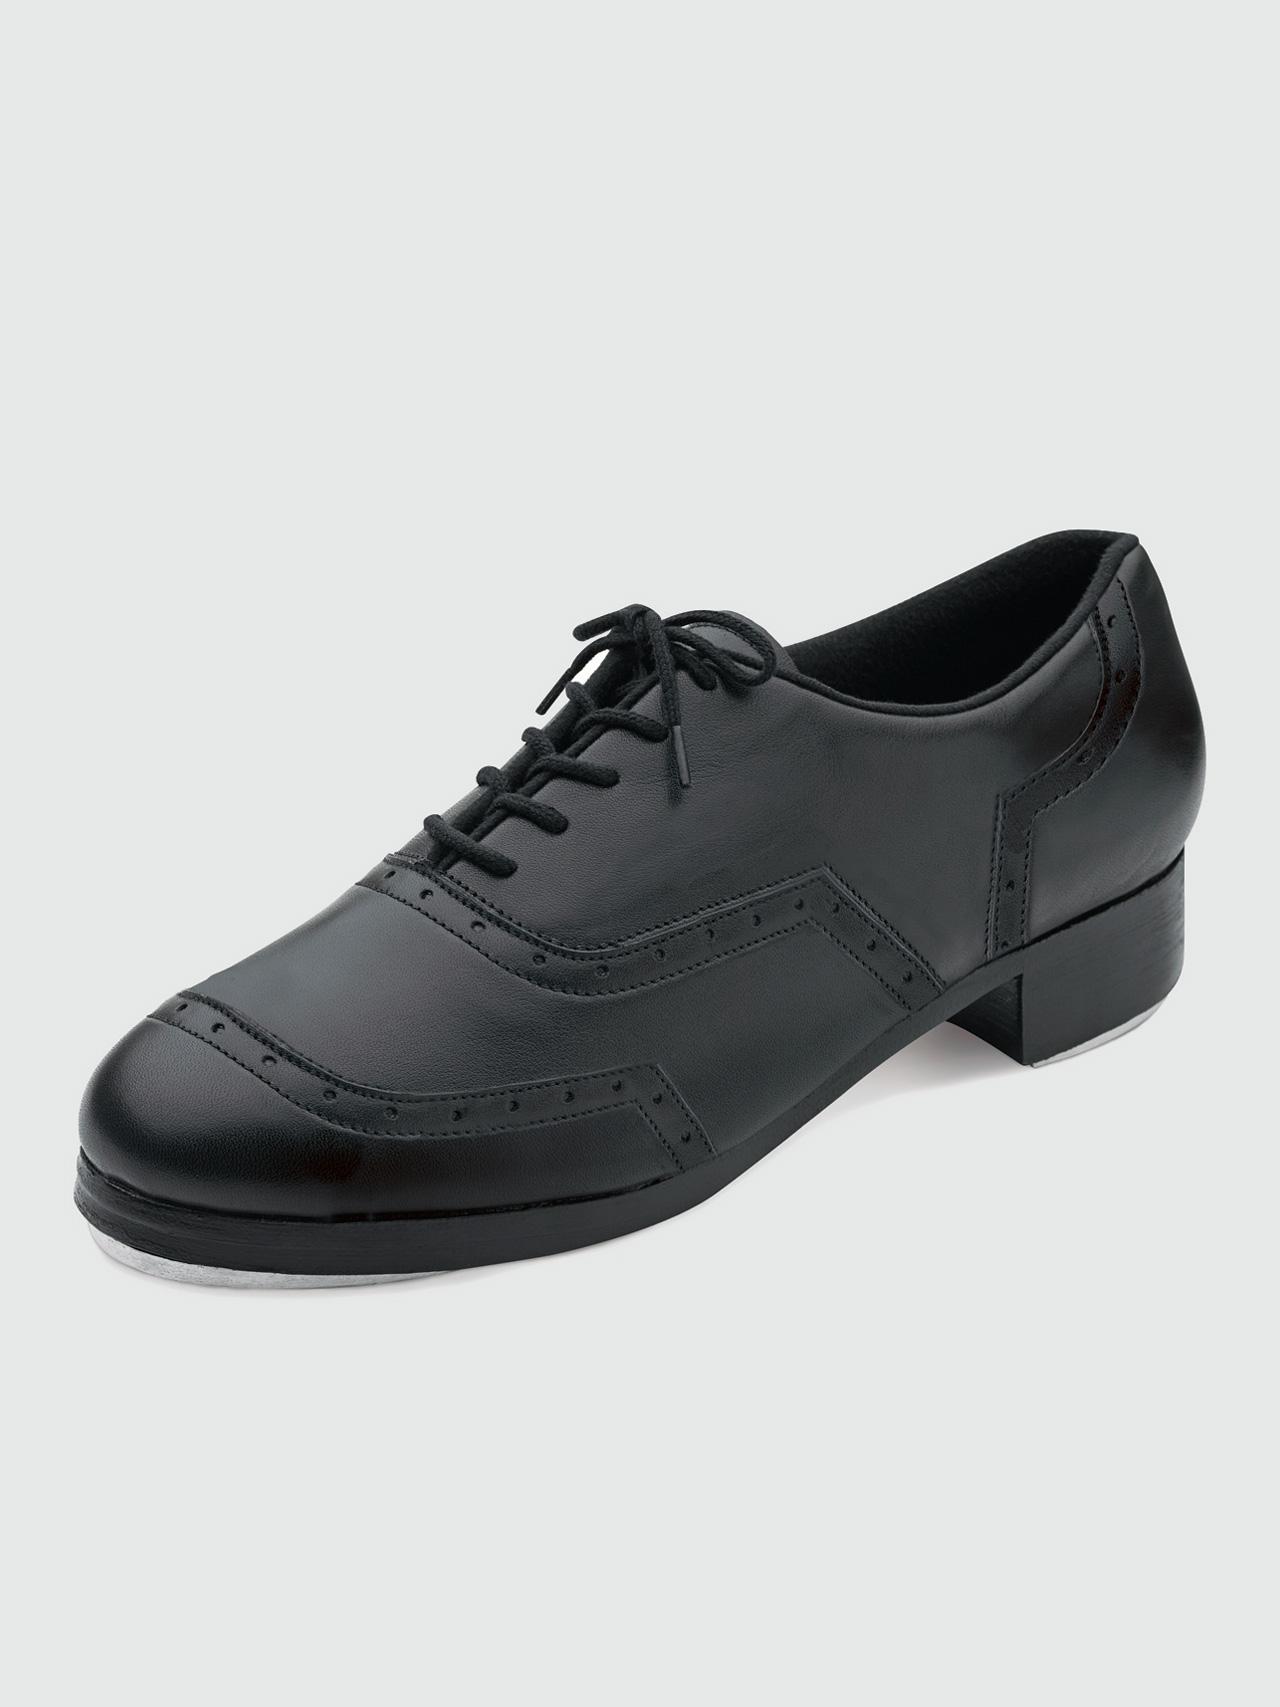 Womens Jason Samuel Smith Lace Up Tap Shoes